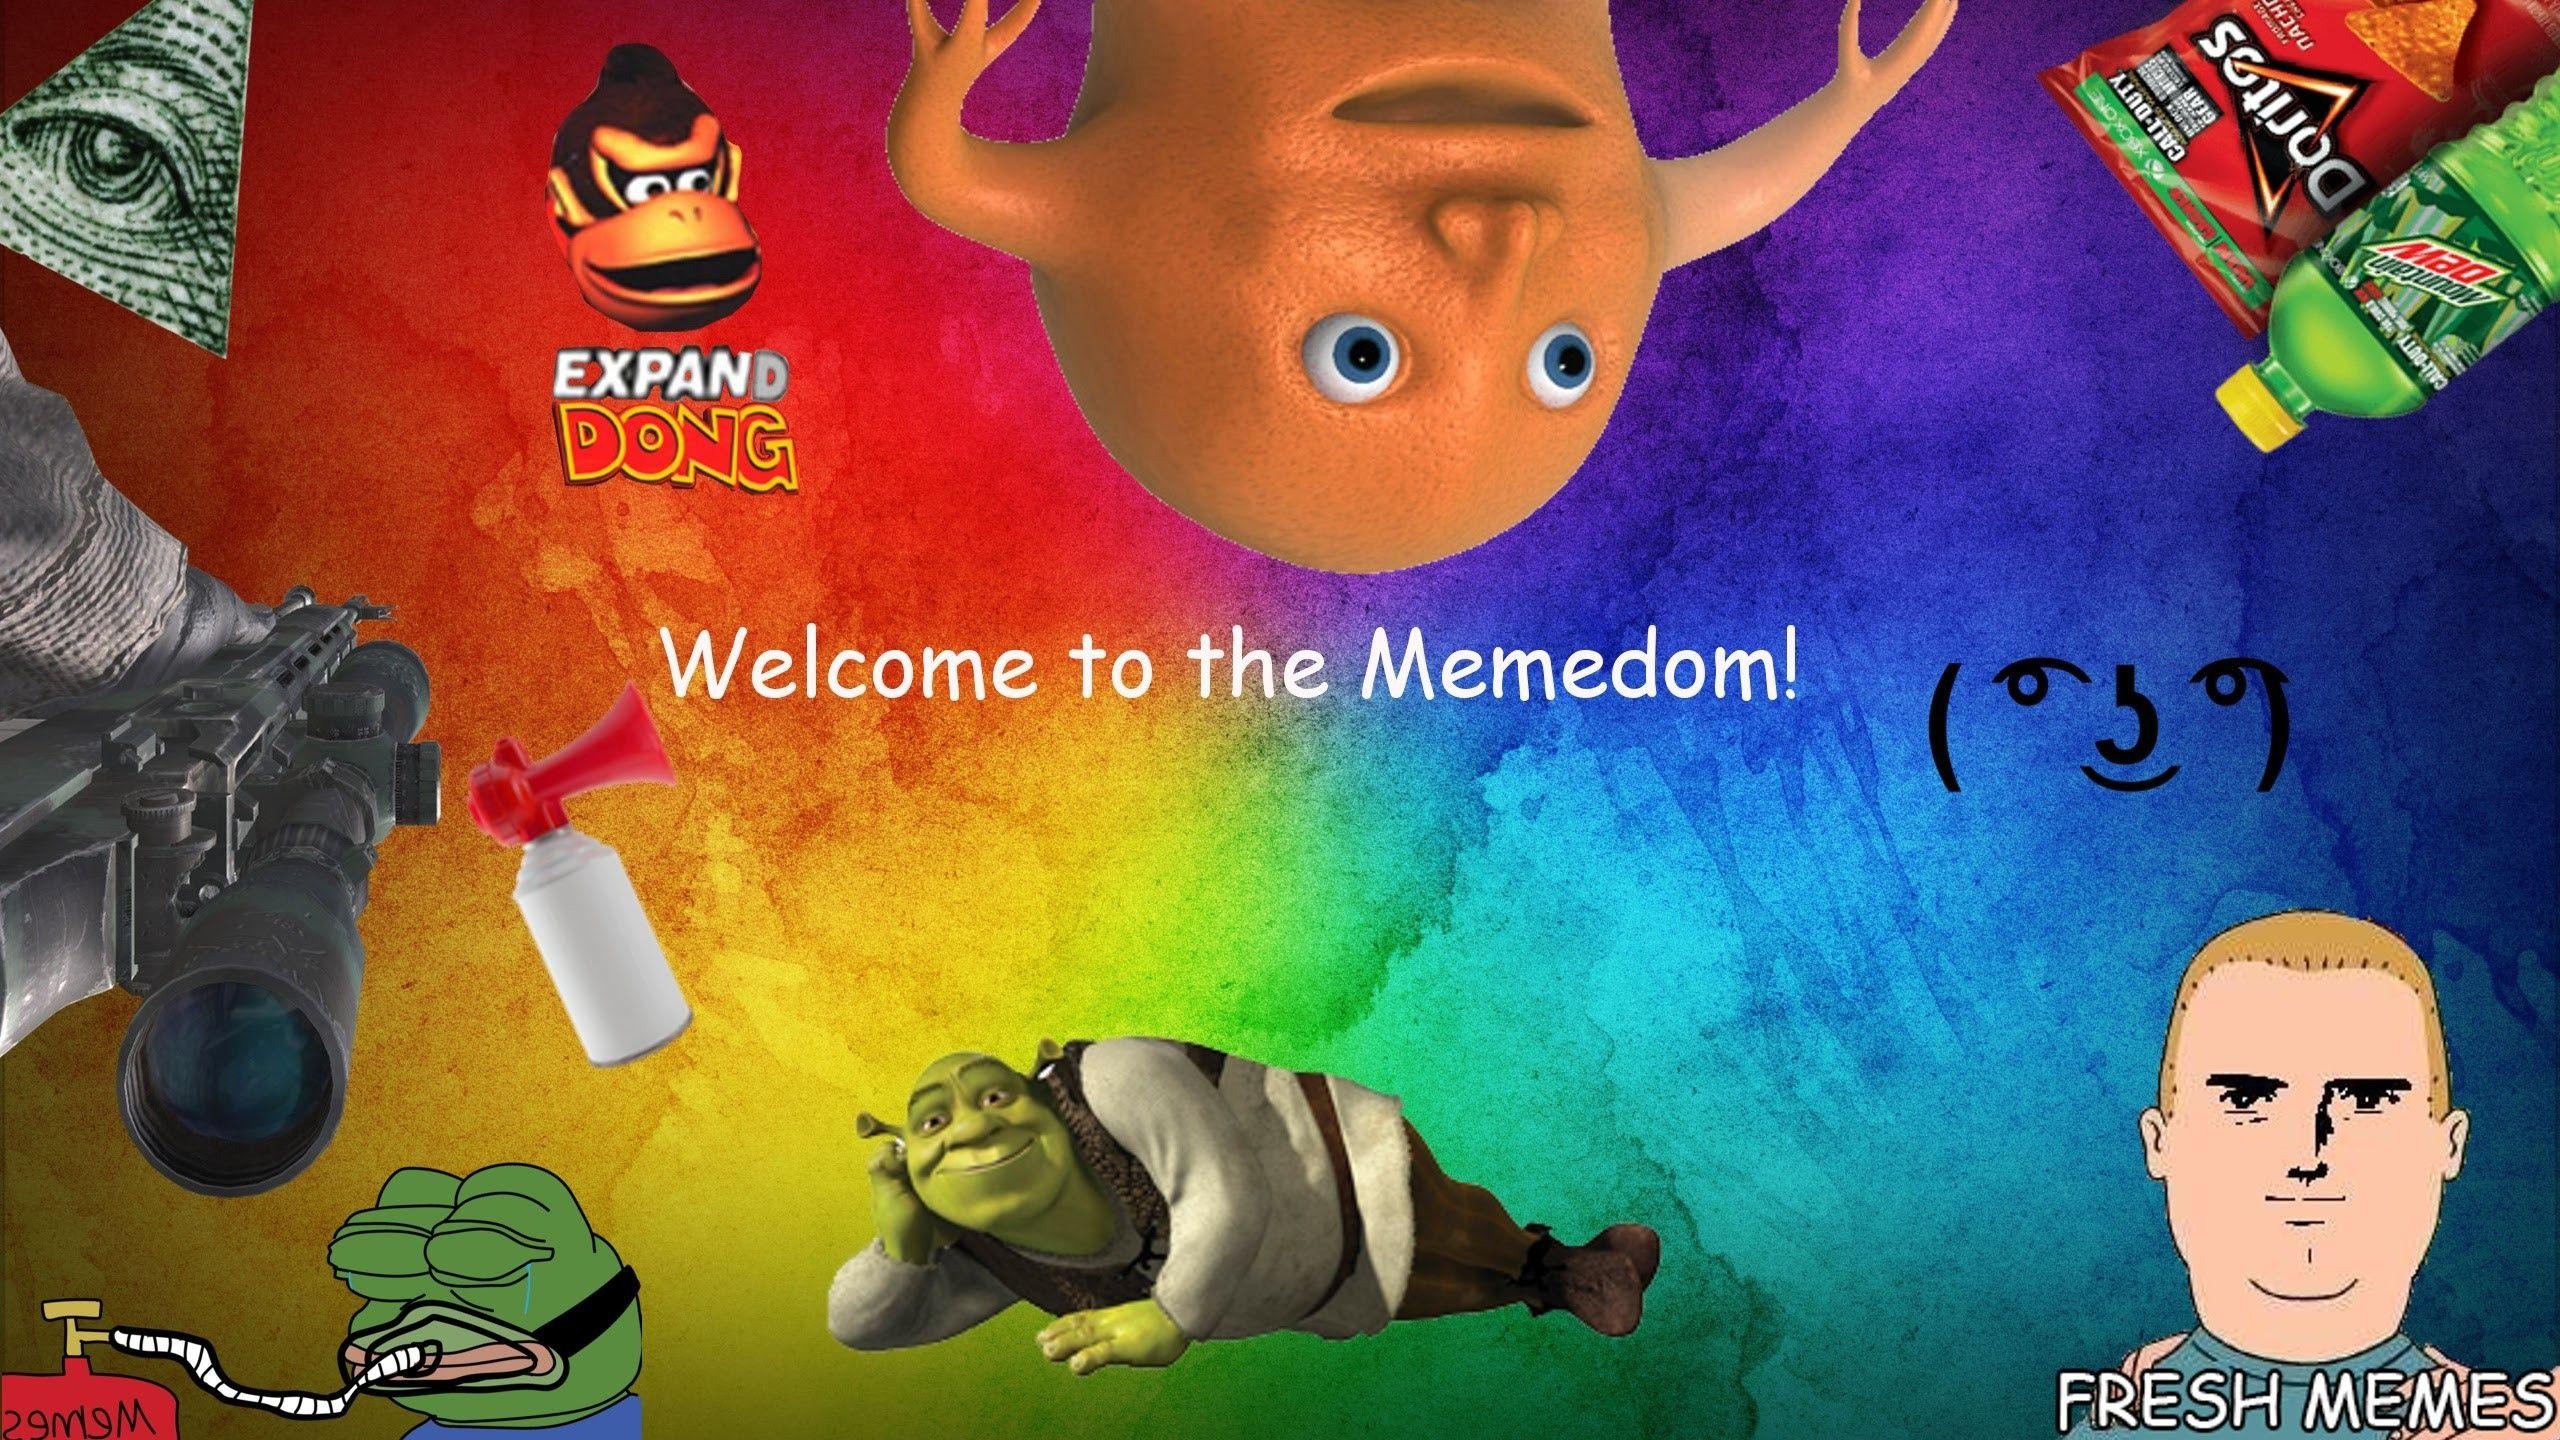 Dank Meme Wallpapers   Top Dank Meme Backgrounds 2560x1440